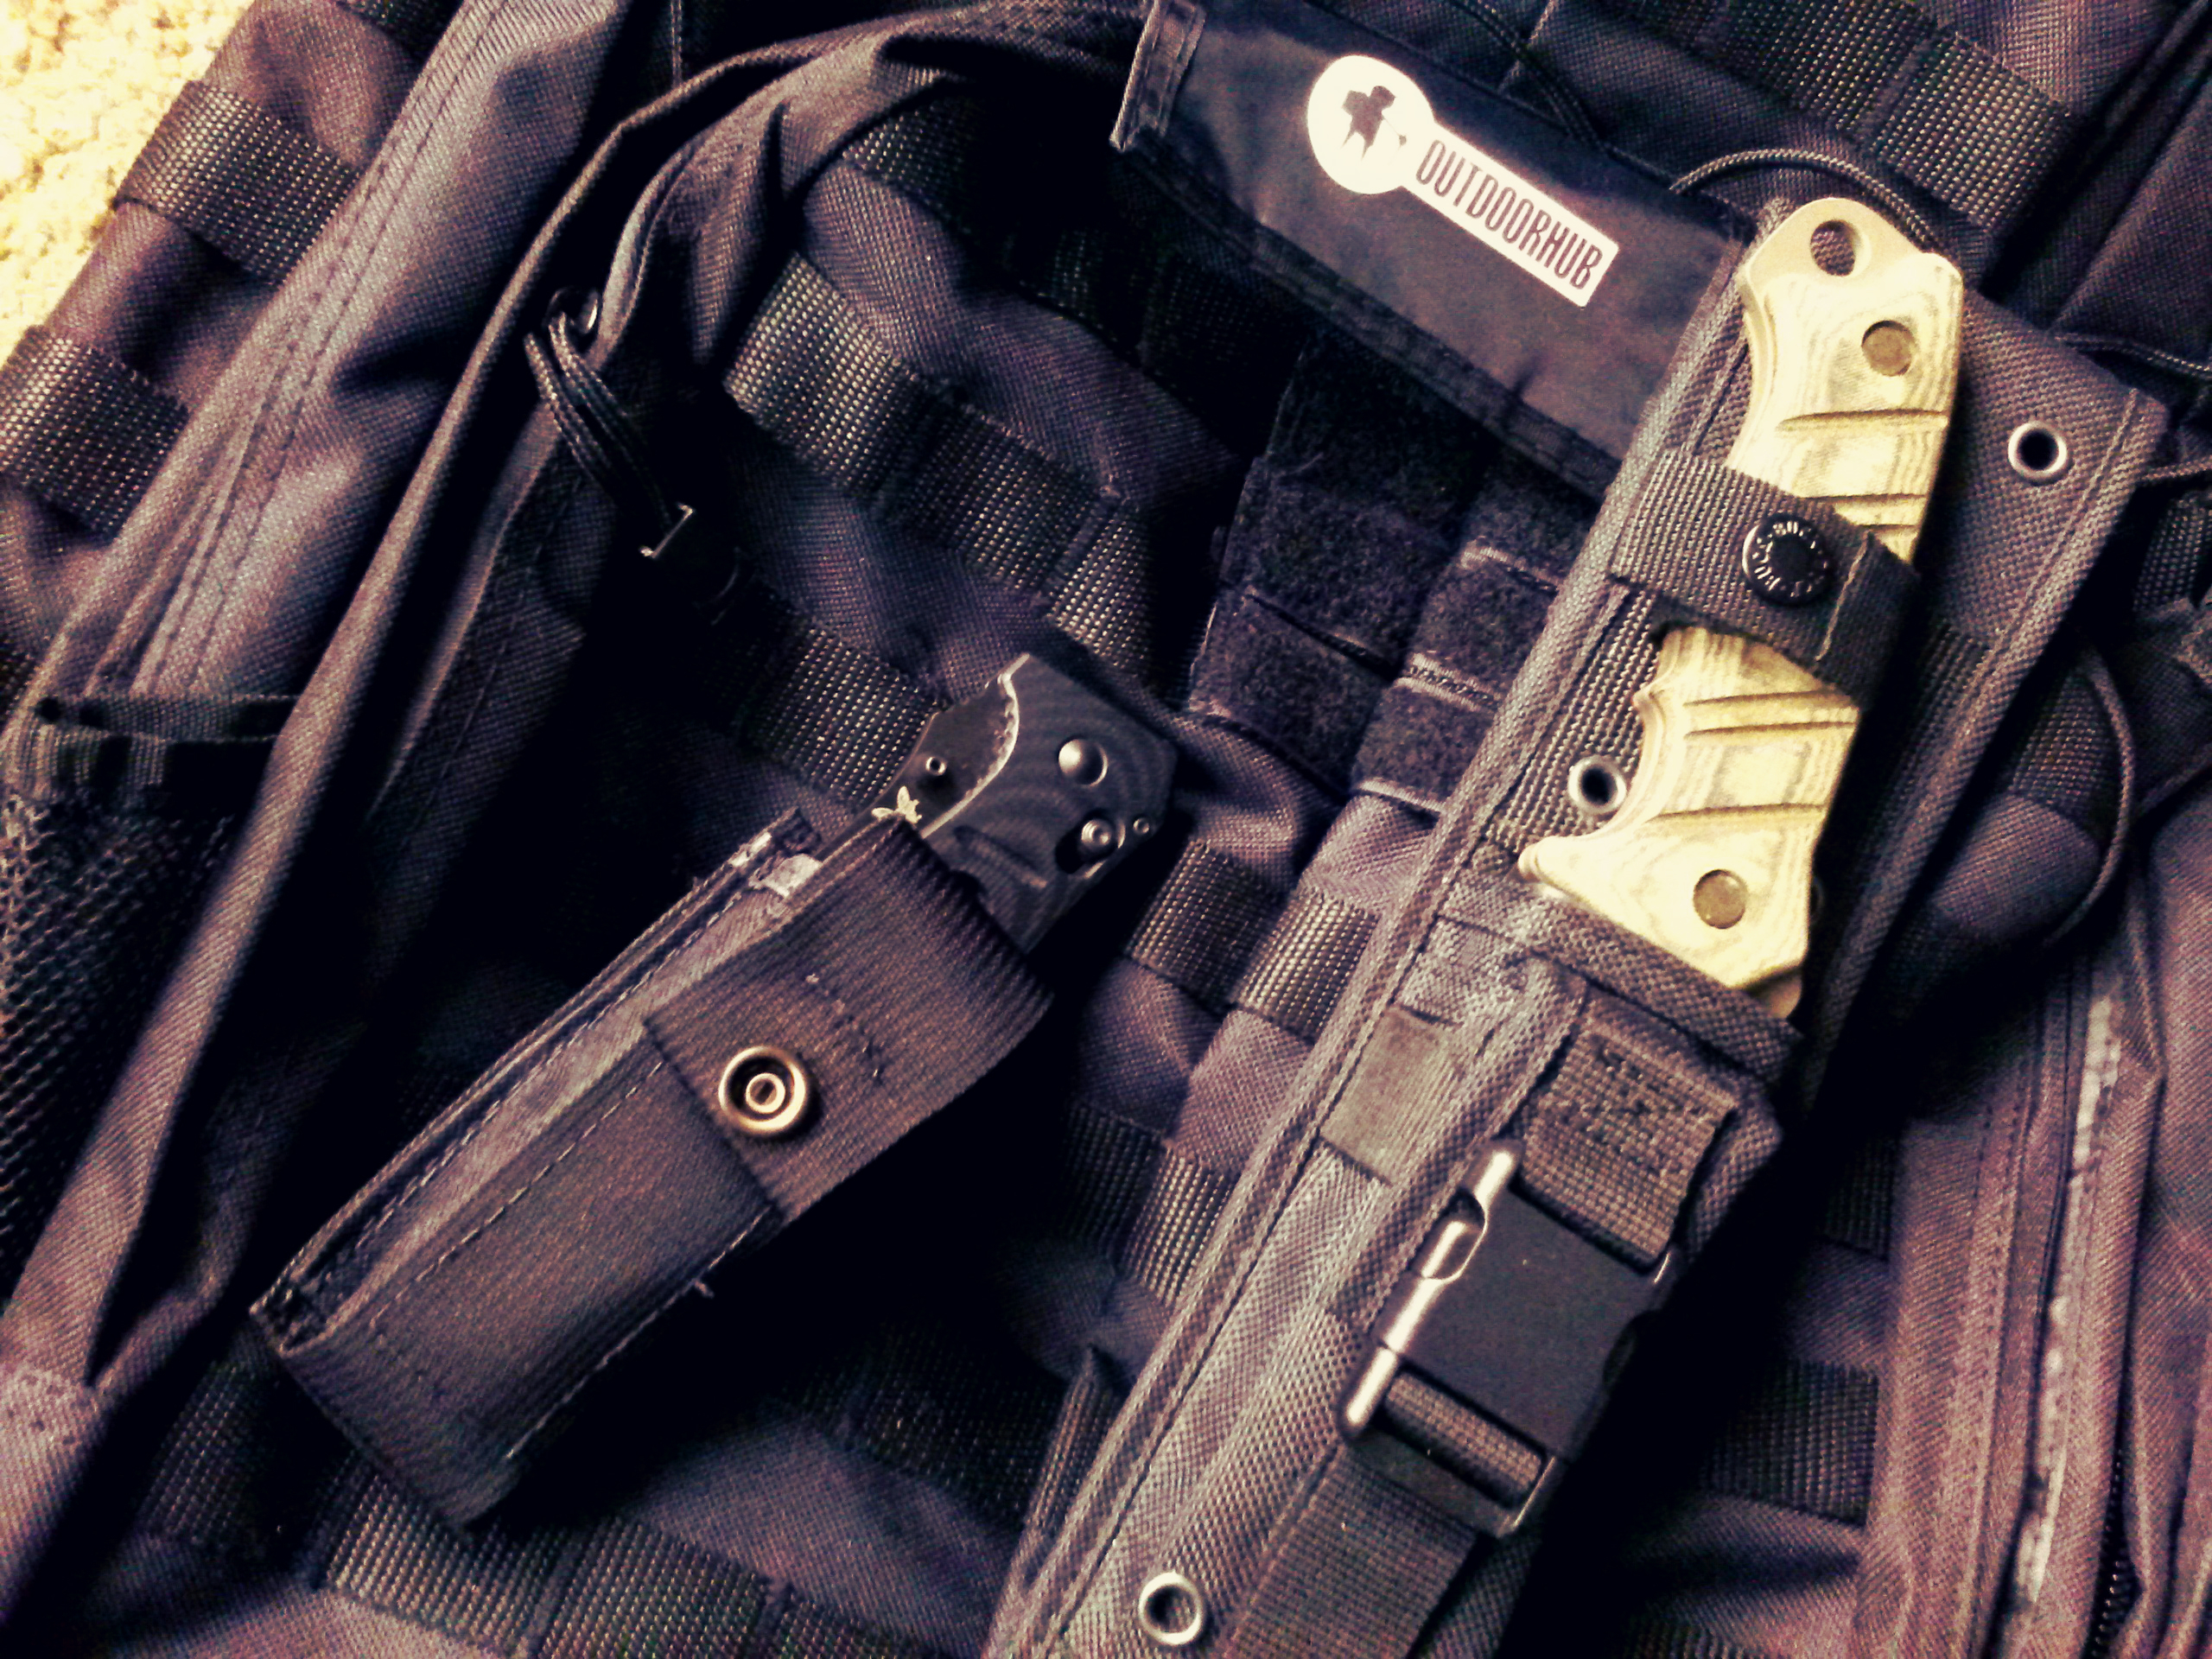 Review: Benchmade Adamas 275 Hard Use Folding Knife - OutdoorHub